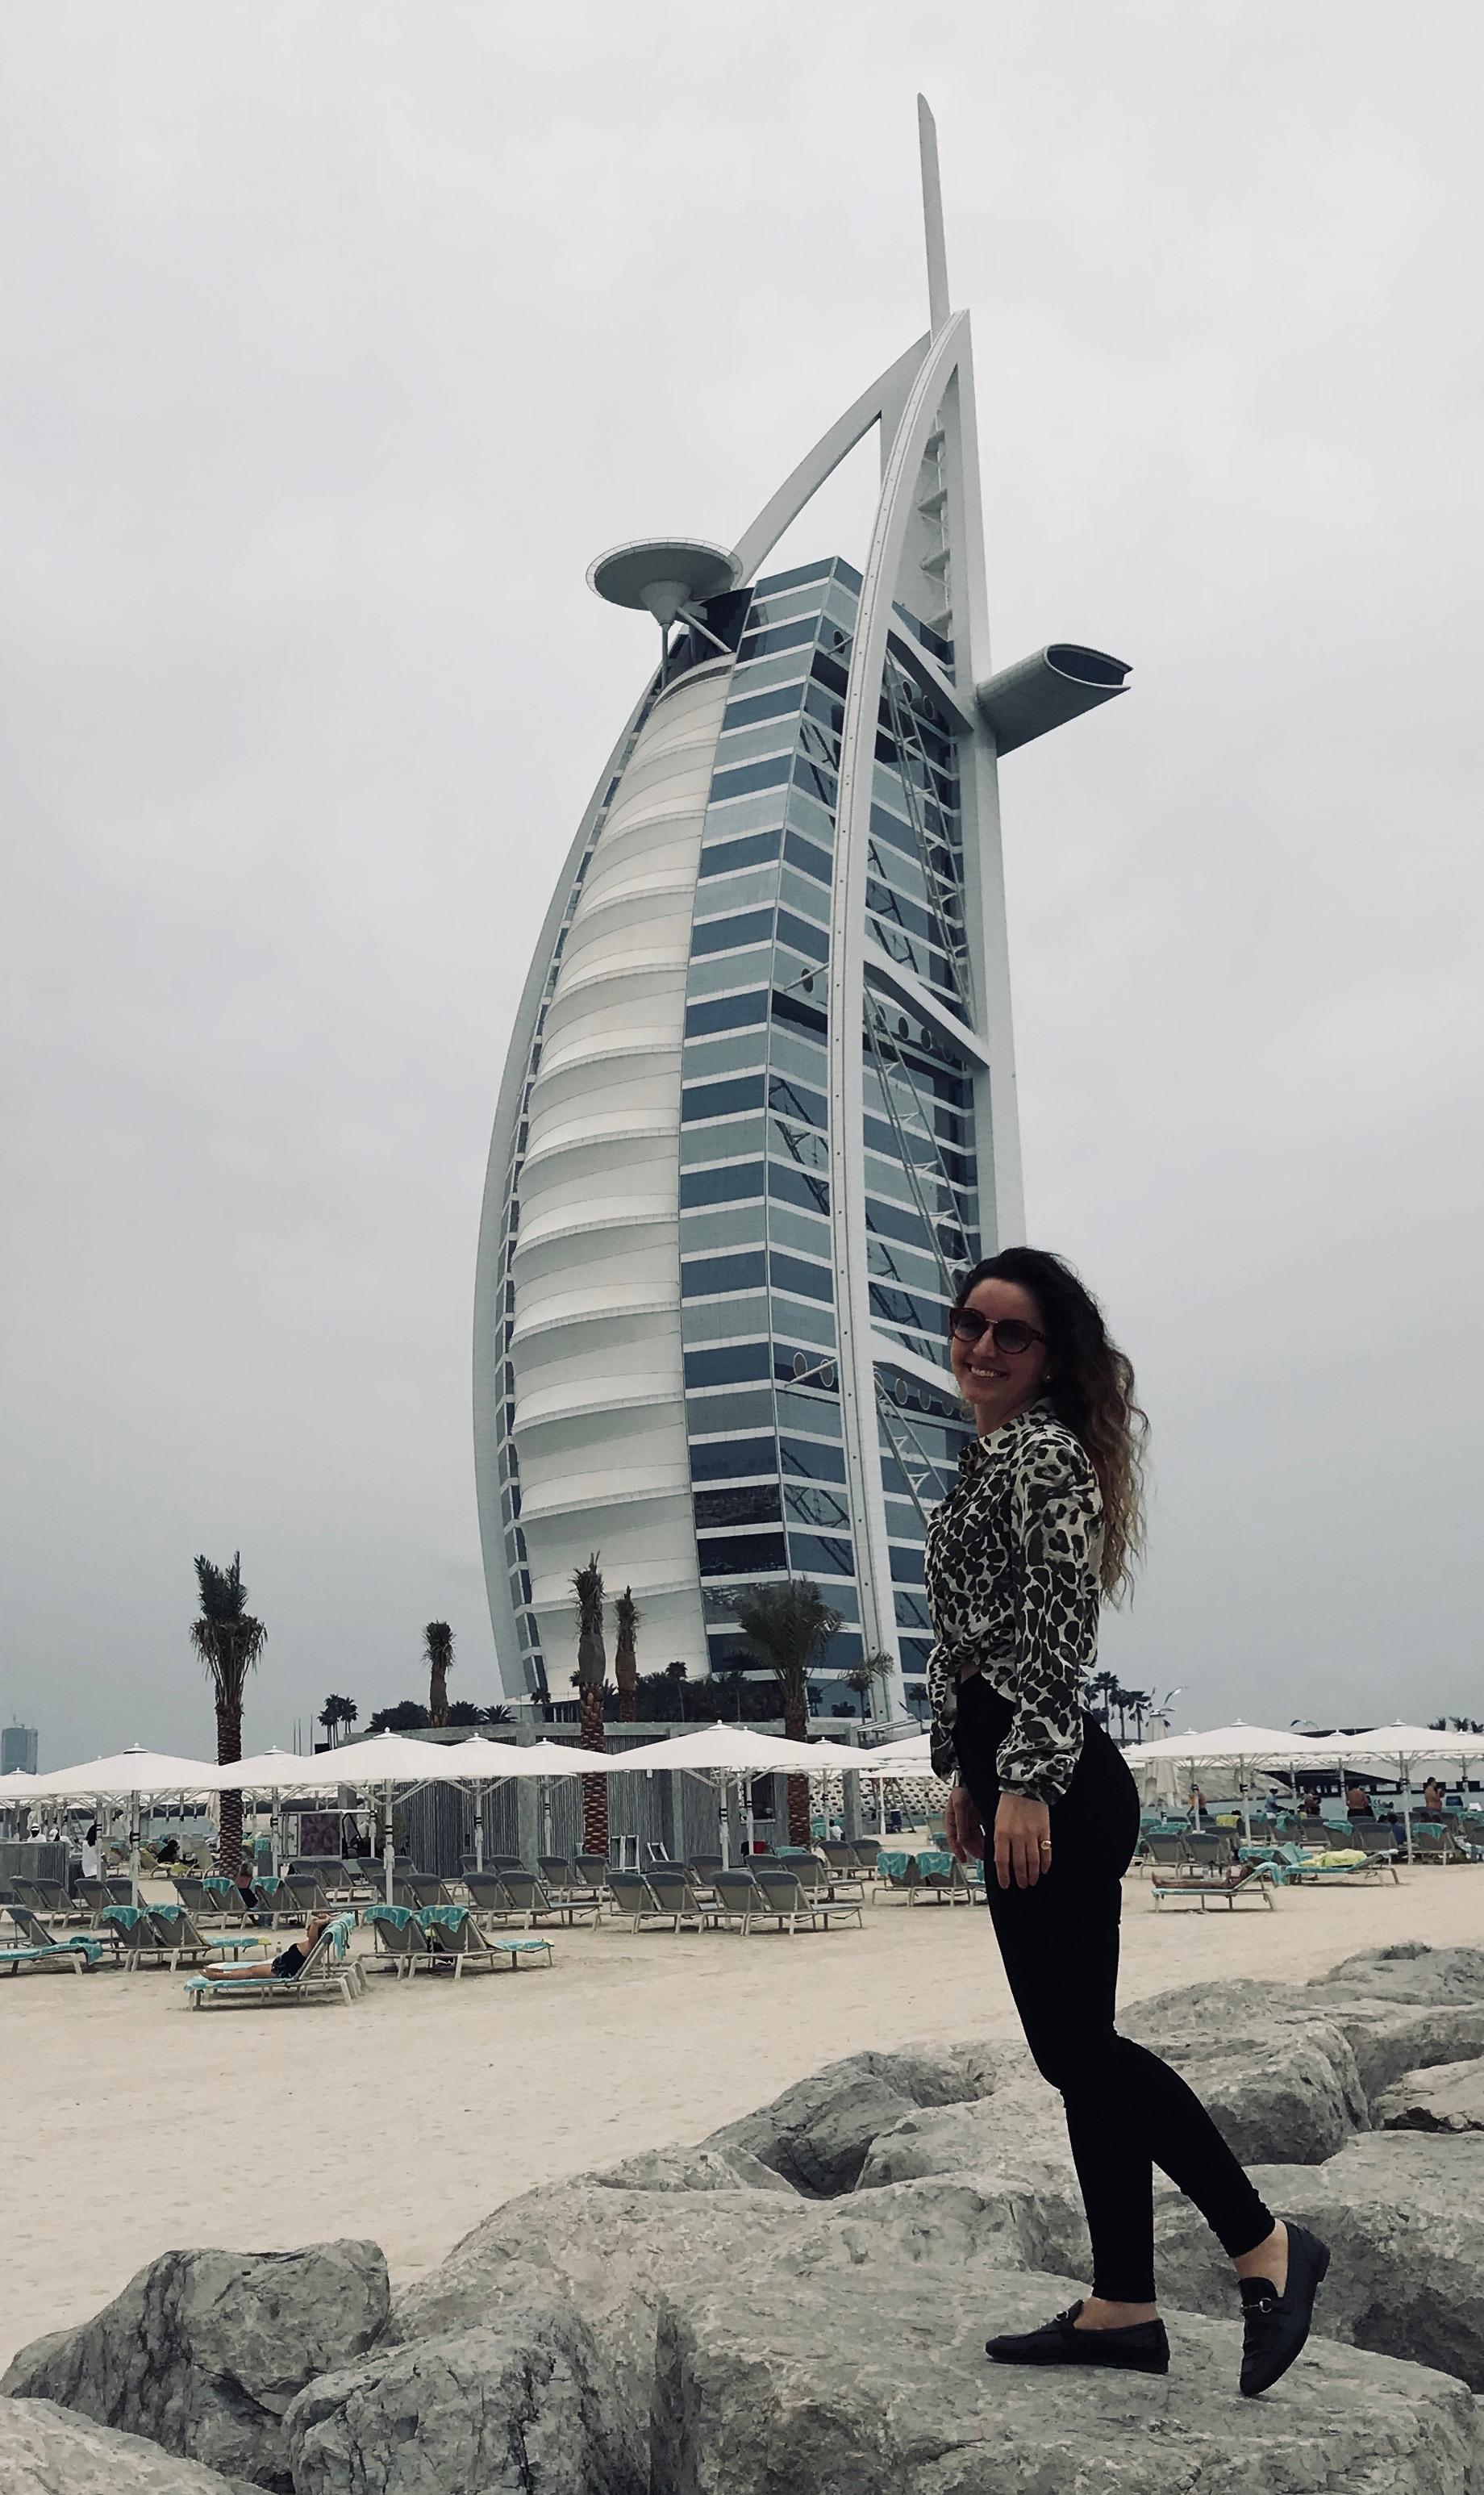 JUMEIRAH BEACH HOTEL • DUBAI, UAE PHOTOGRAPHER: DIANA TURNER